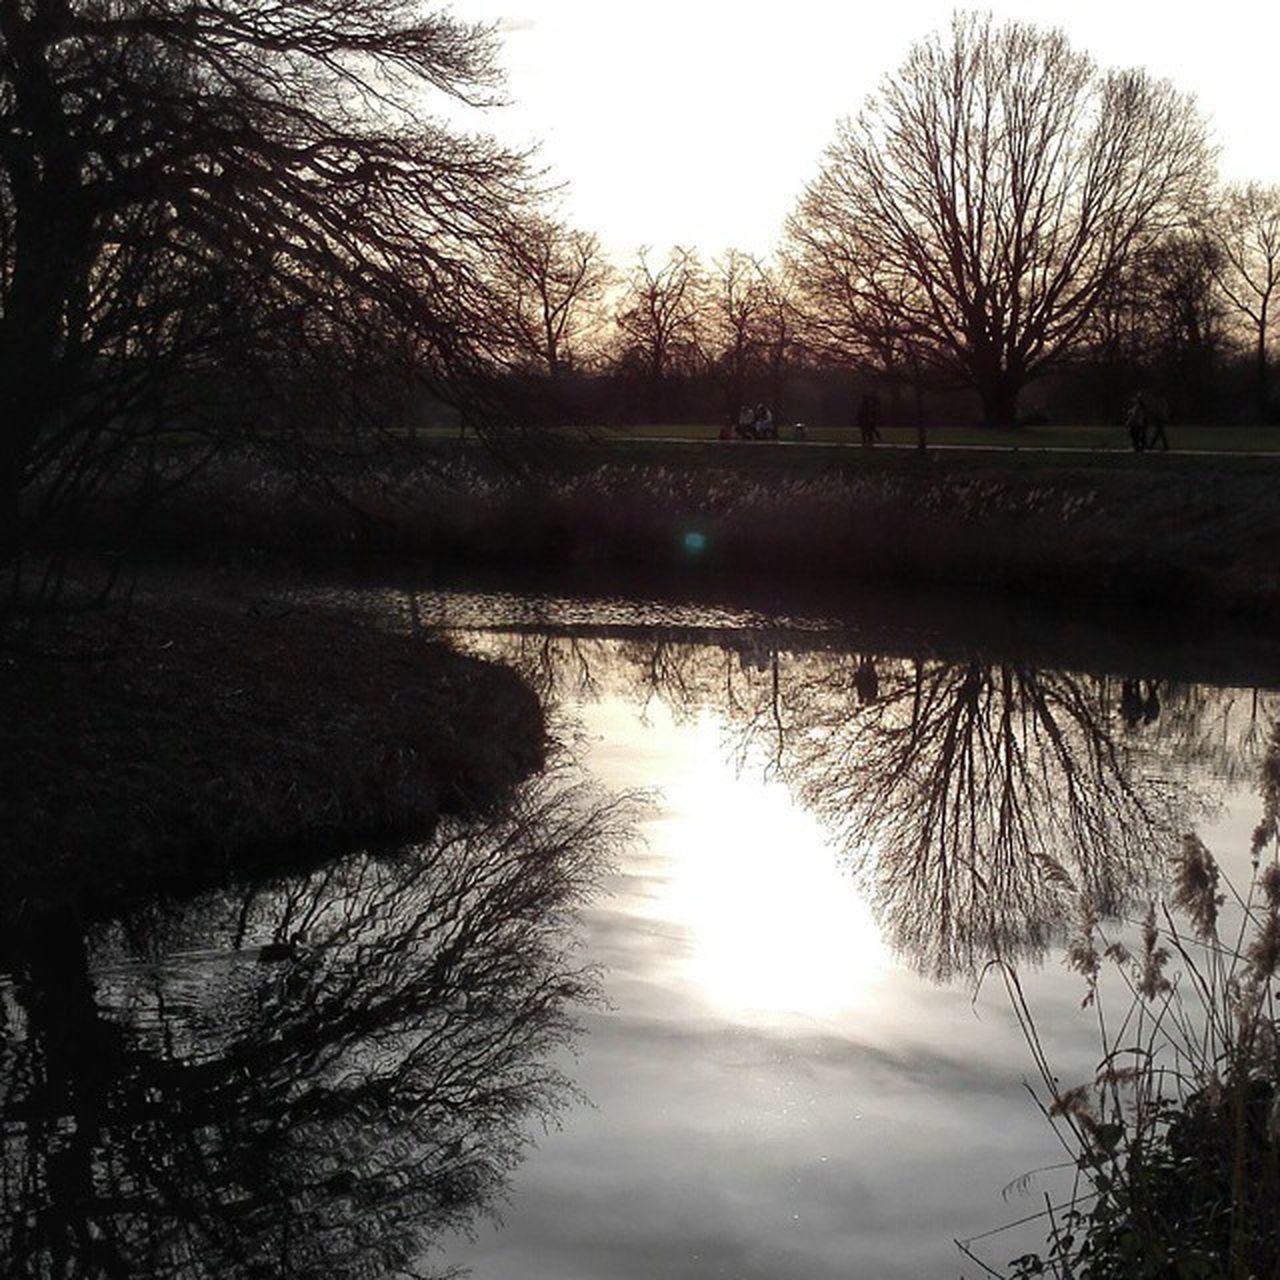 Gestern im Park der BurgLinn entstanden als der Tag sich langsam dem Ende neigte. Park LinnerBurg Burg Linn Krefeld KrefeldLinn nrw instamood iggermany castle